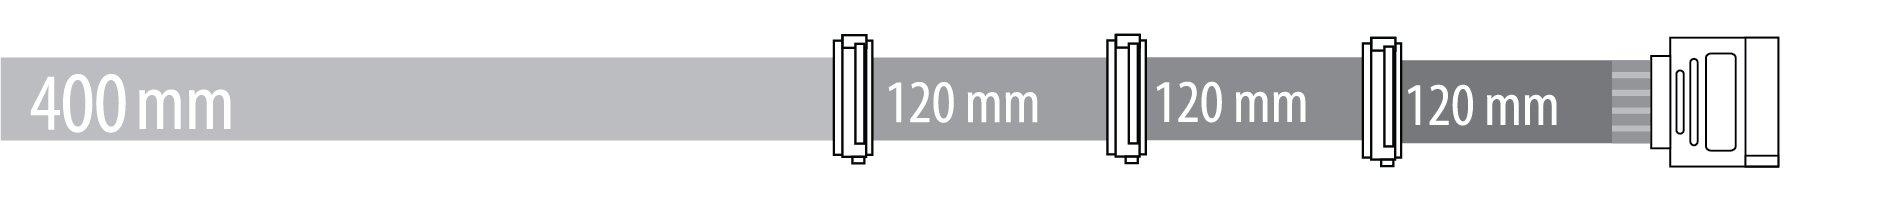 SATA 400 + 120 + 120 + 120 mm